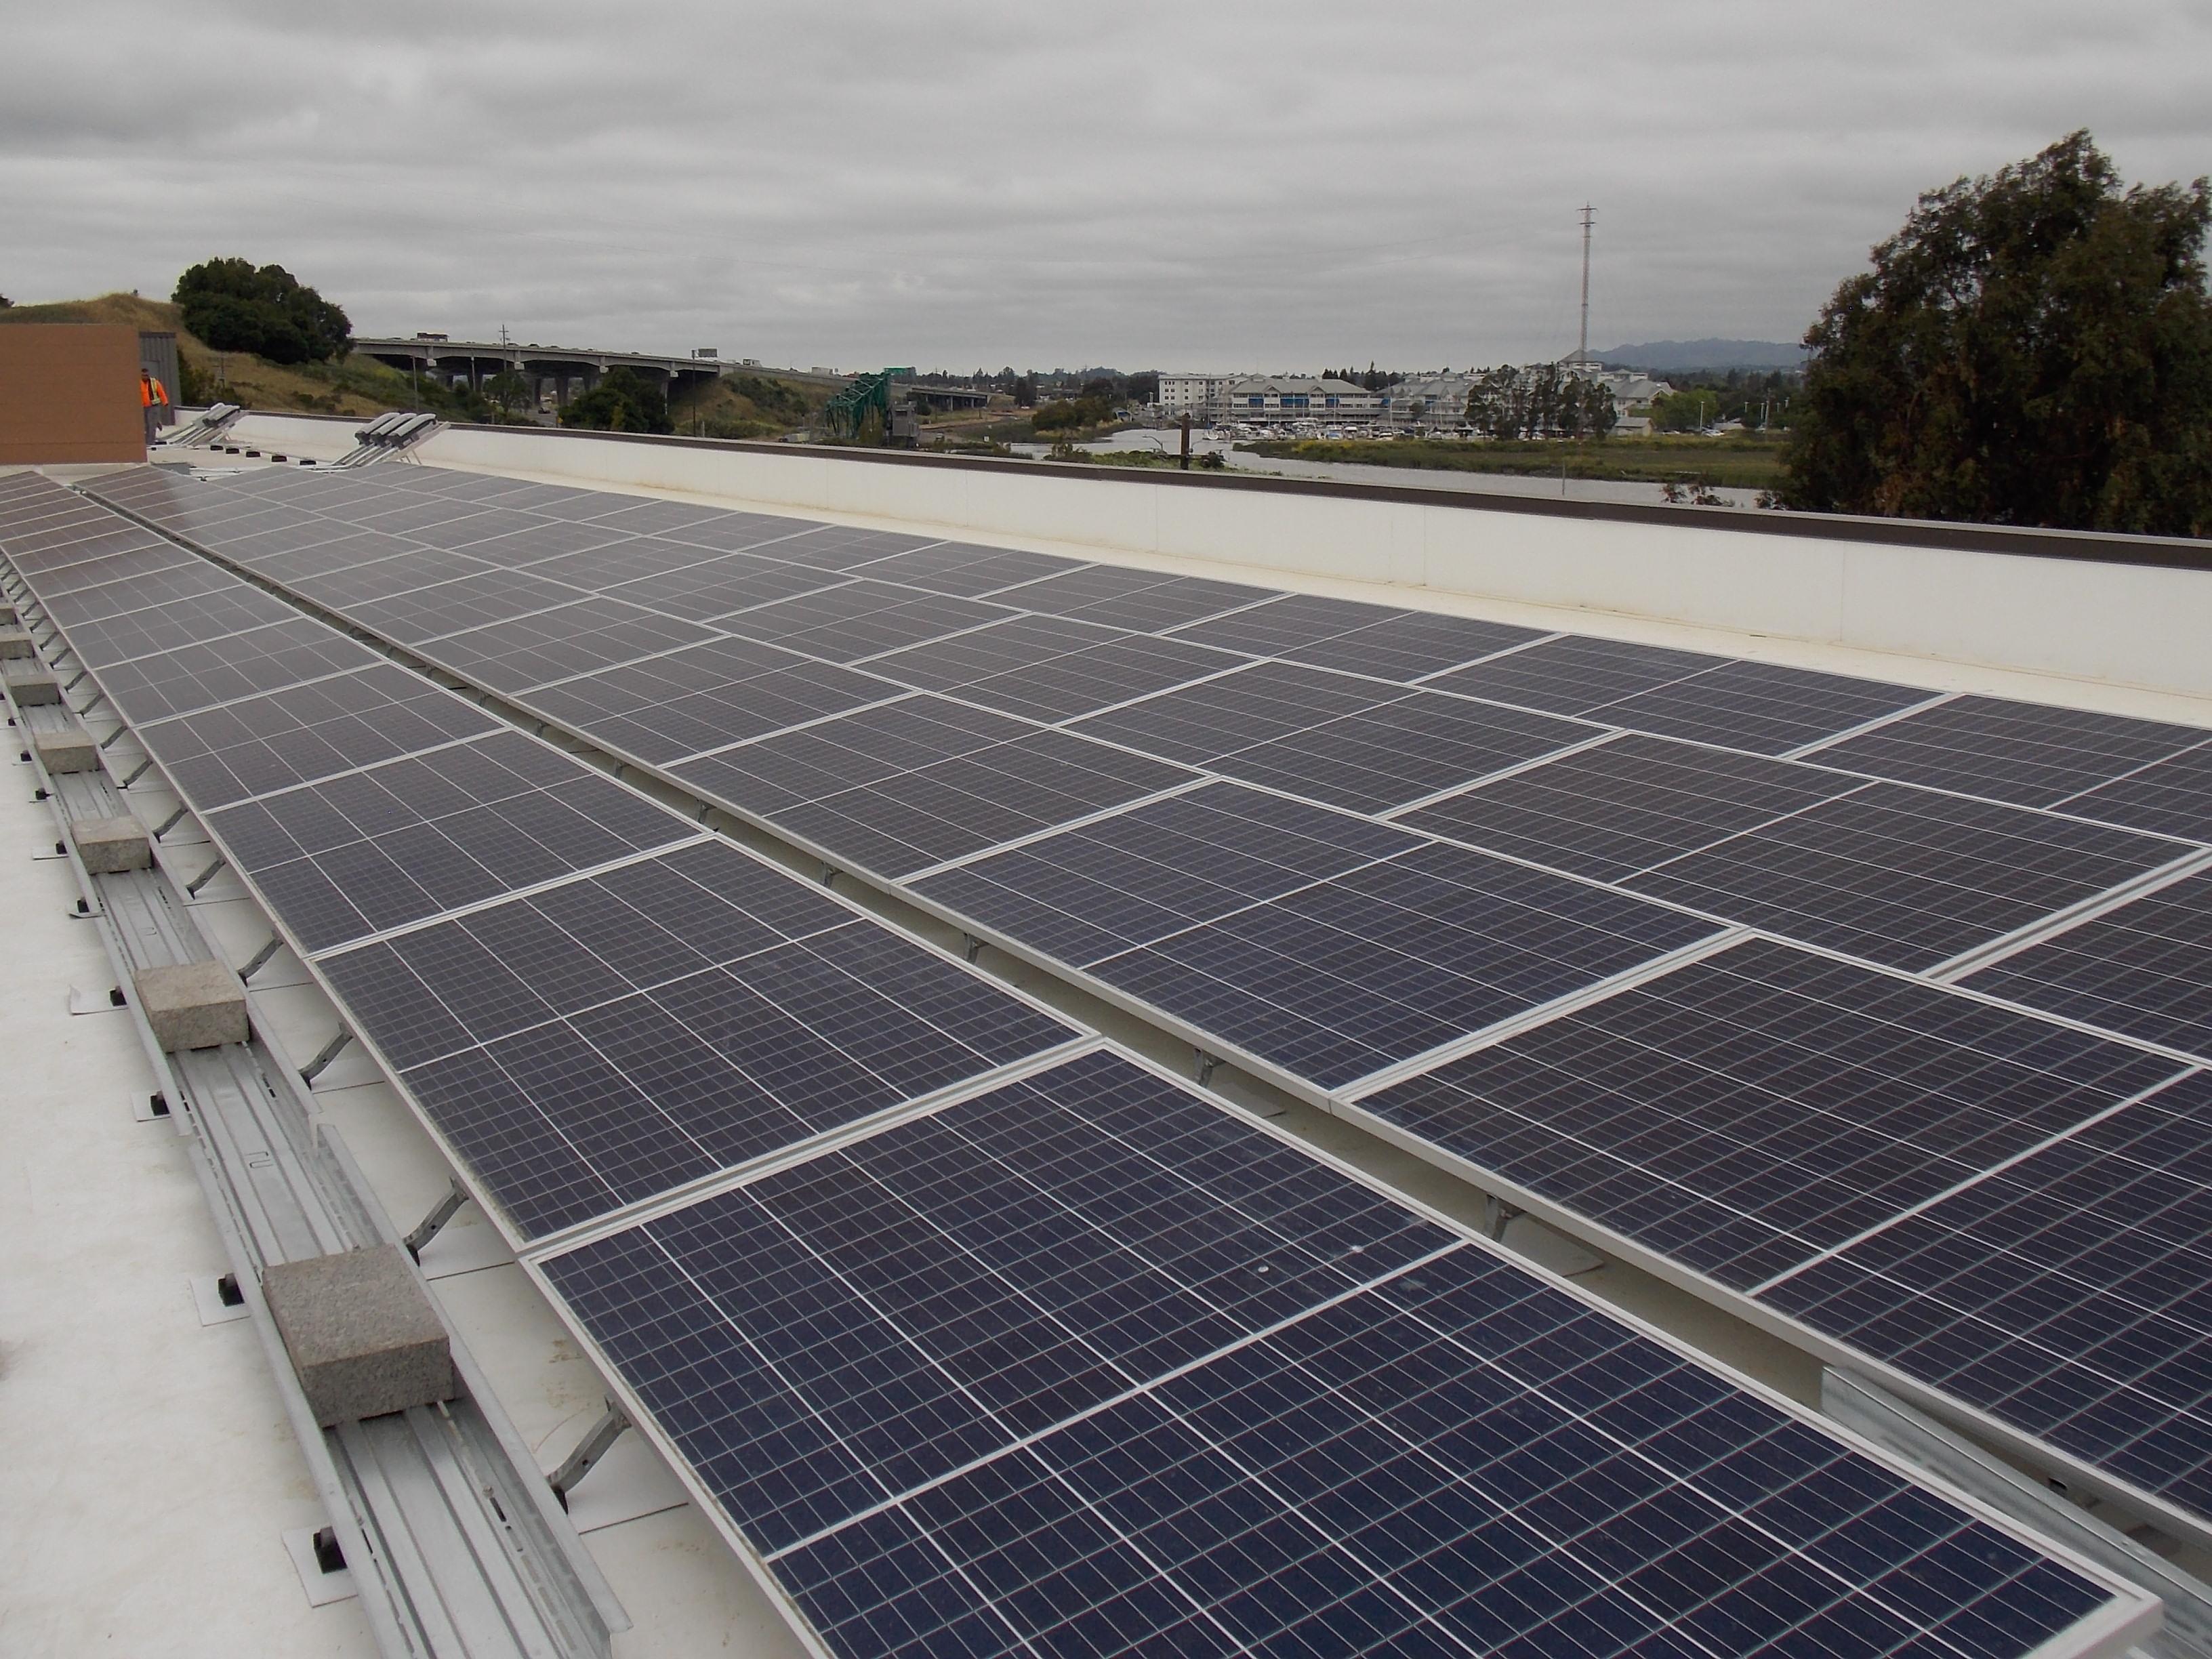 SolarCraft Completes Solar Power System at Petaluma Public Storage - North Bay Storage Facility Goes Solar and Saves on Energy Bills